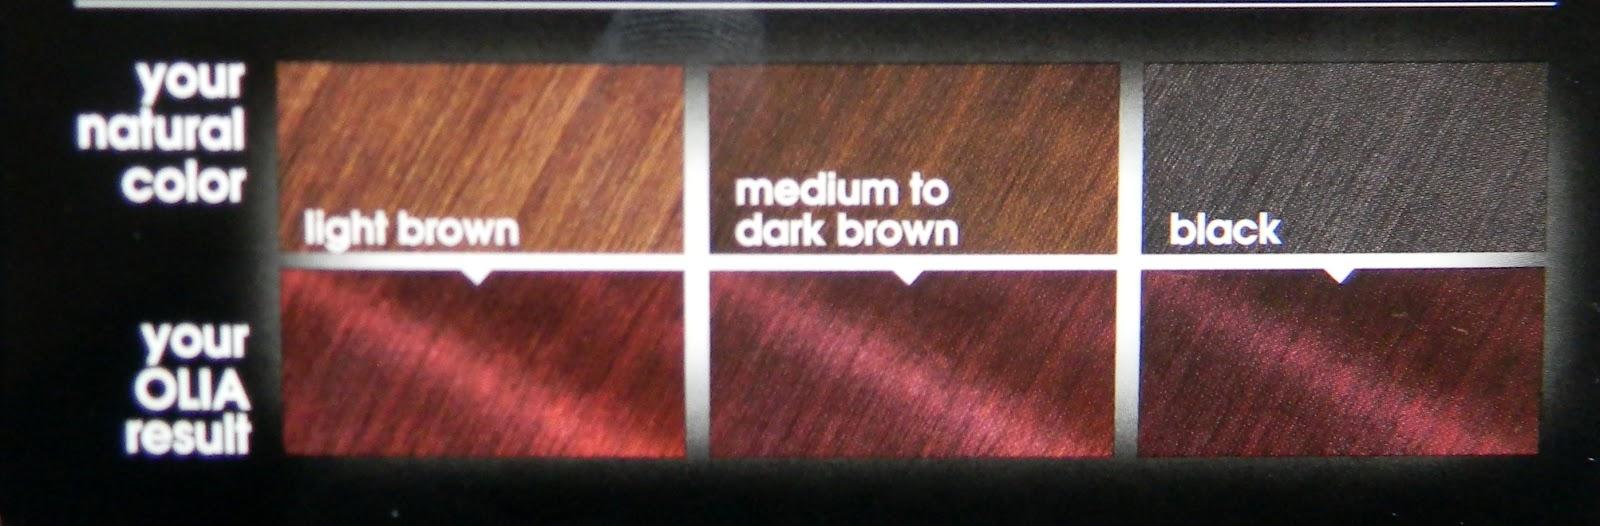 Dark Intense Auburn Red Hair Color Dark intense auburn!